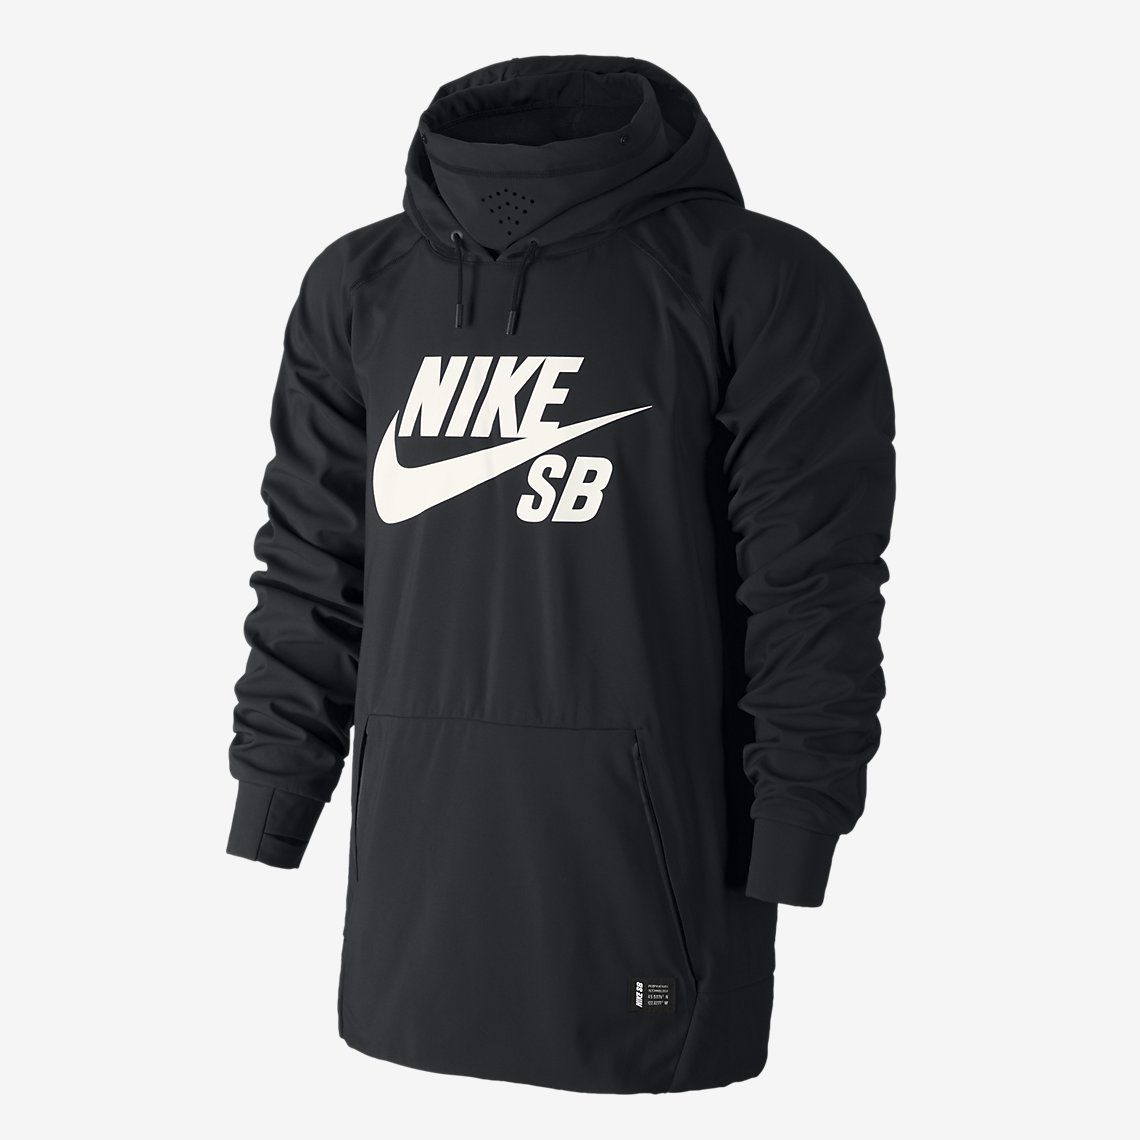 buy popular 78867 958a5 Taille : XL Nike SB Enigma – Sweat à capuche pour Homme ...